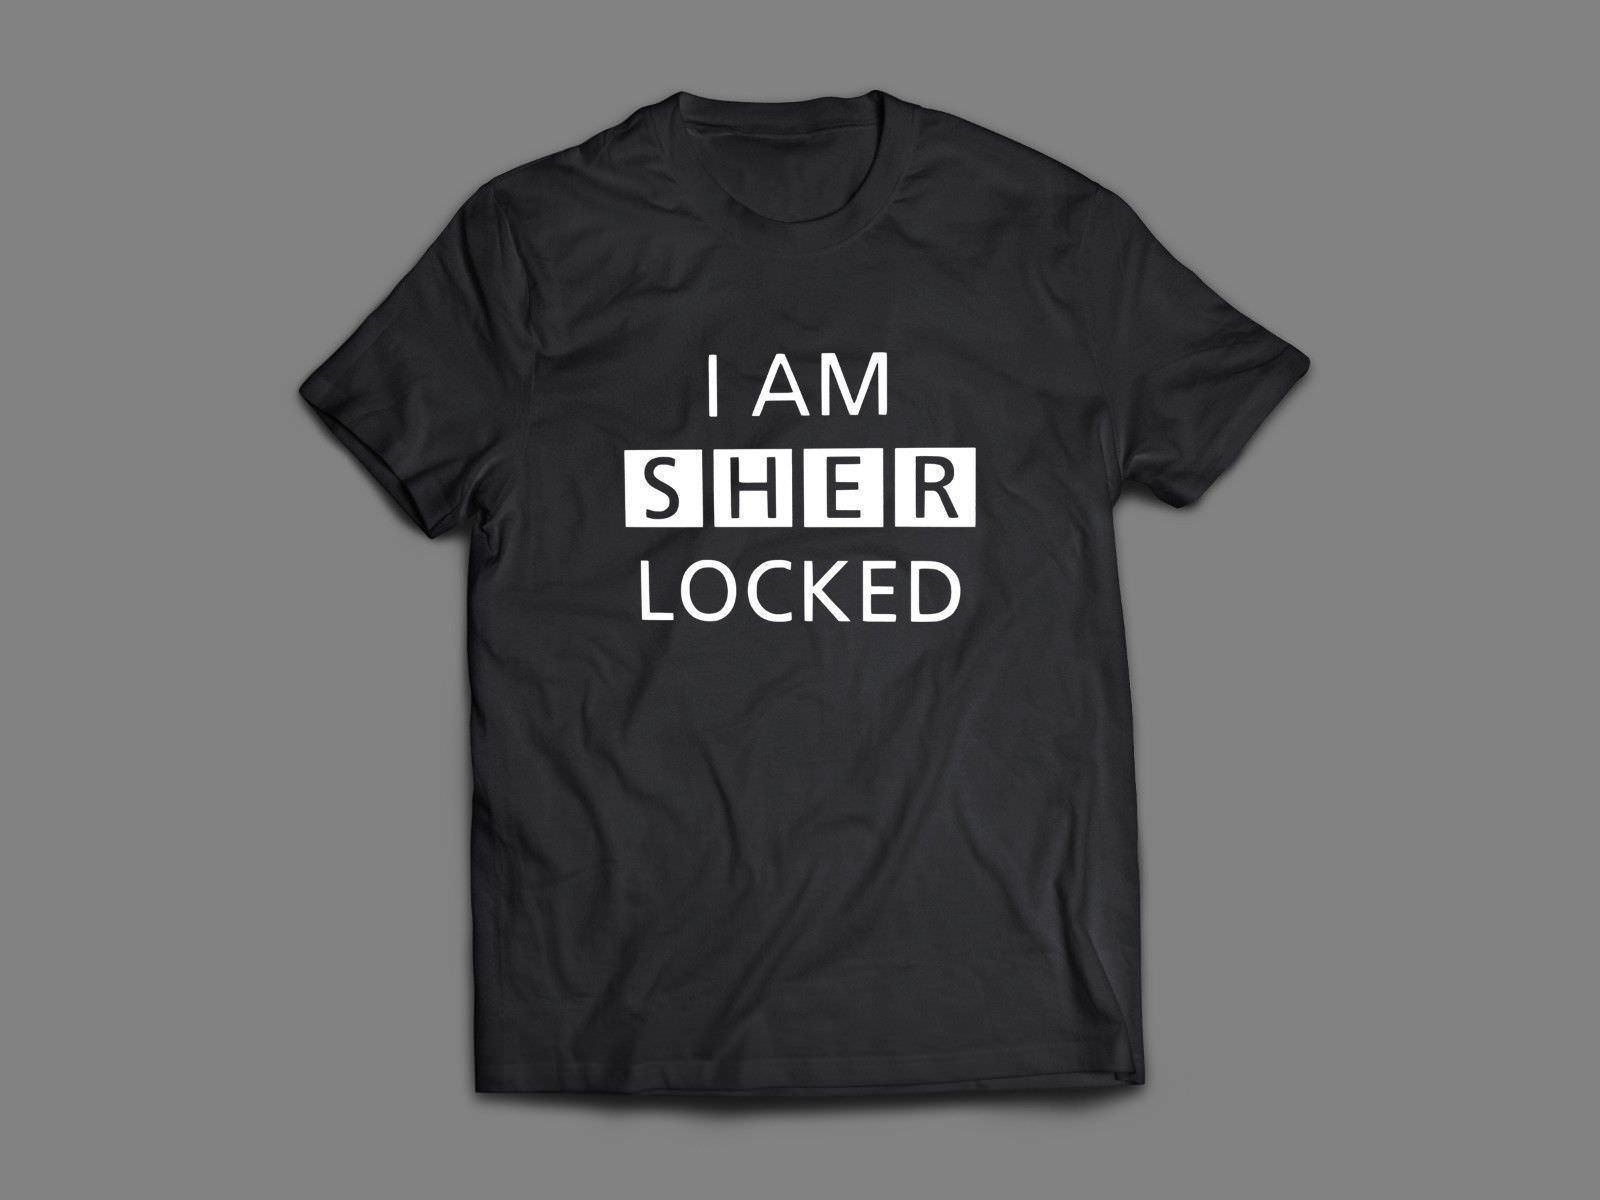 Sherlock Holmes I Am Sherlocked Sherlock Tv Series T Shirtfunny Free Shipping Unisex Casual Top